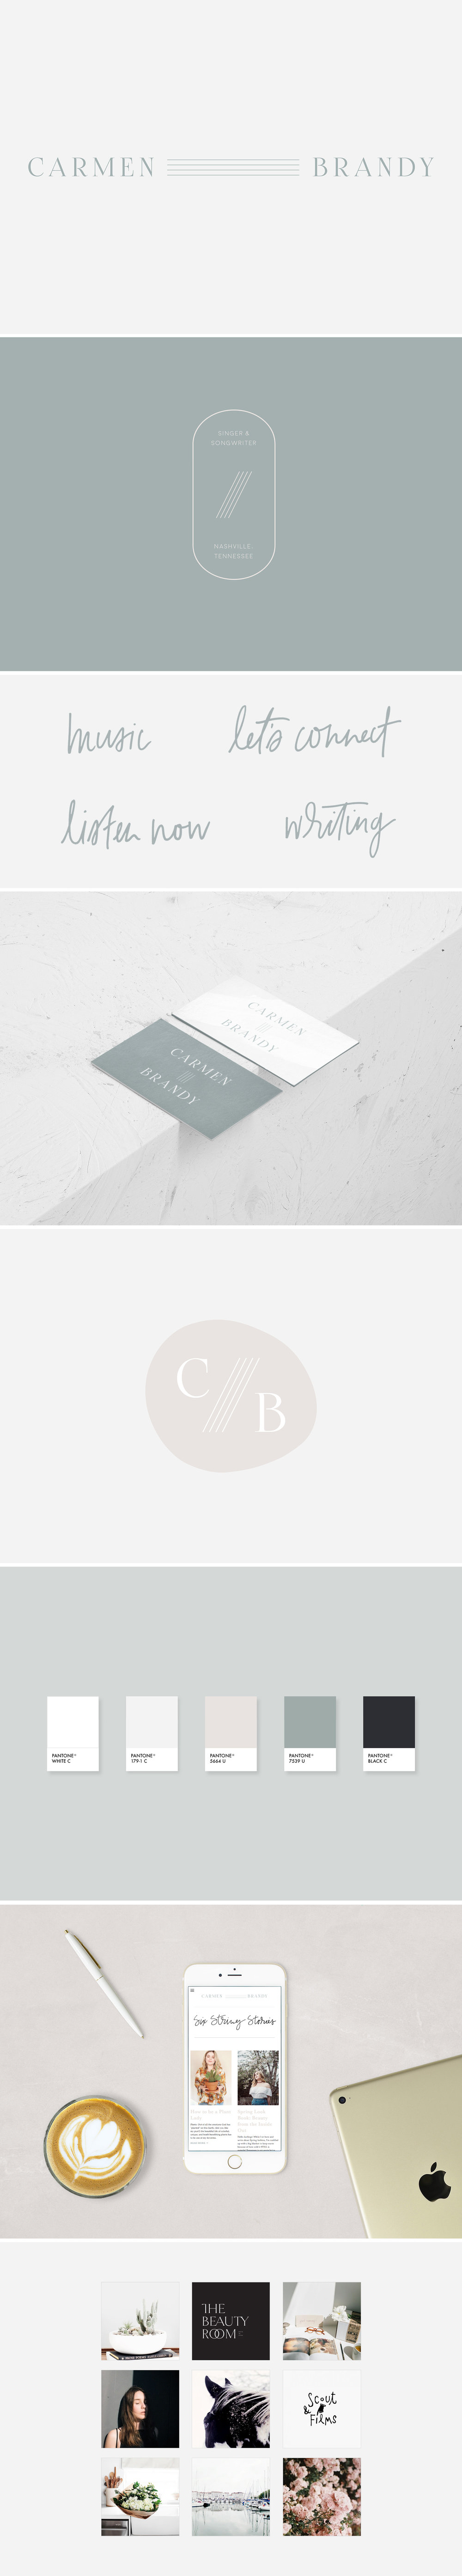 Carmen Brandy | youthful, bohemian, raw, authentic branding | Reux Design Co.